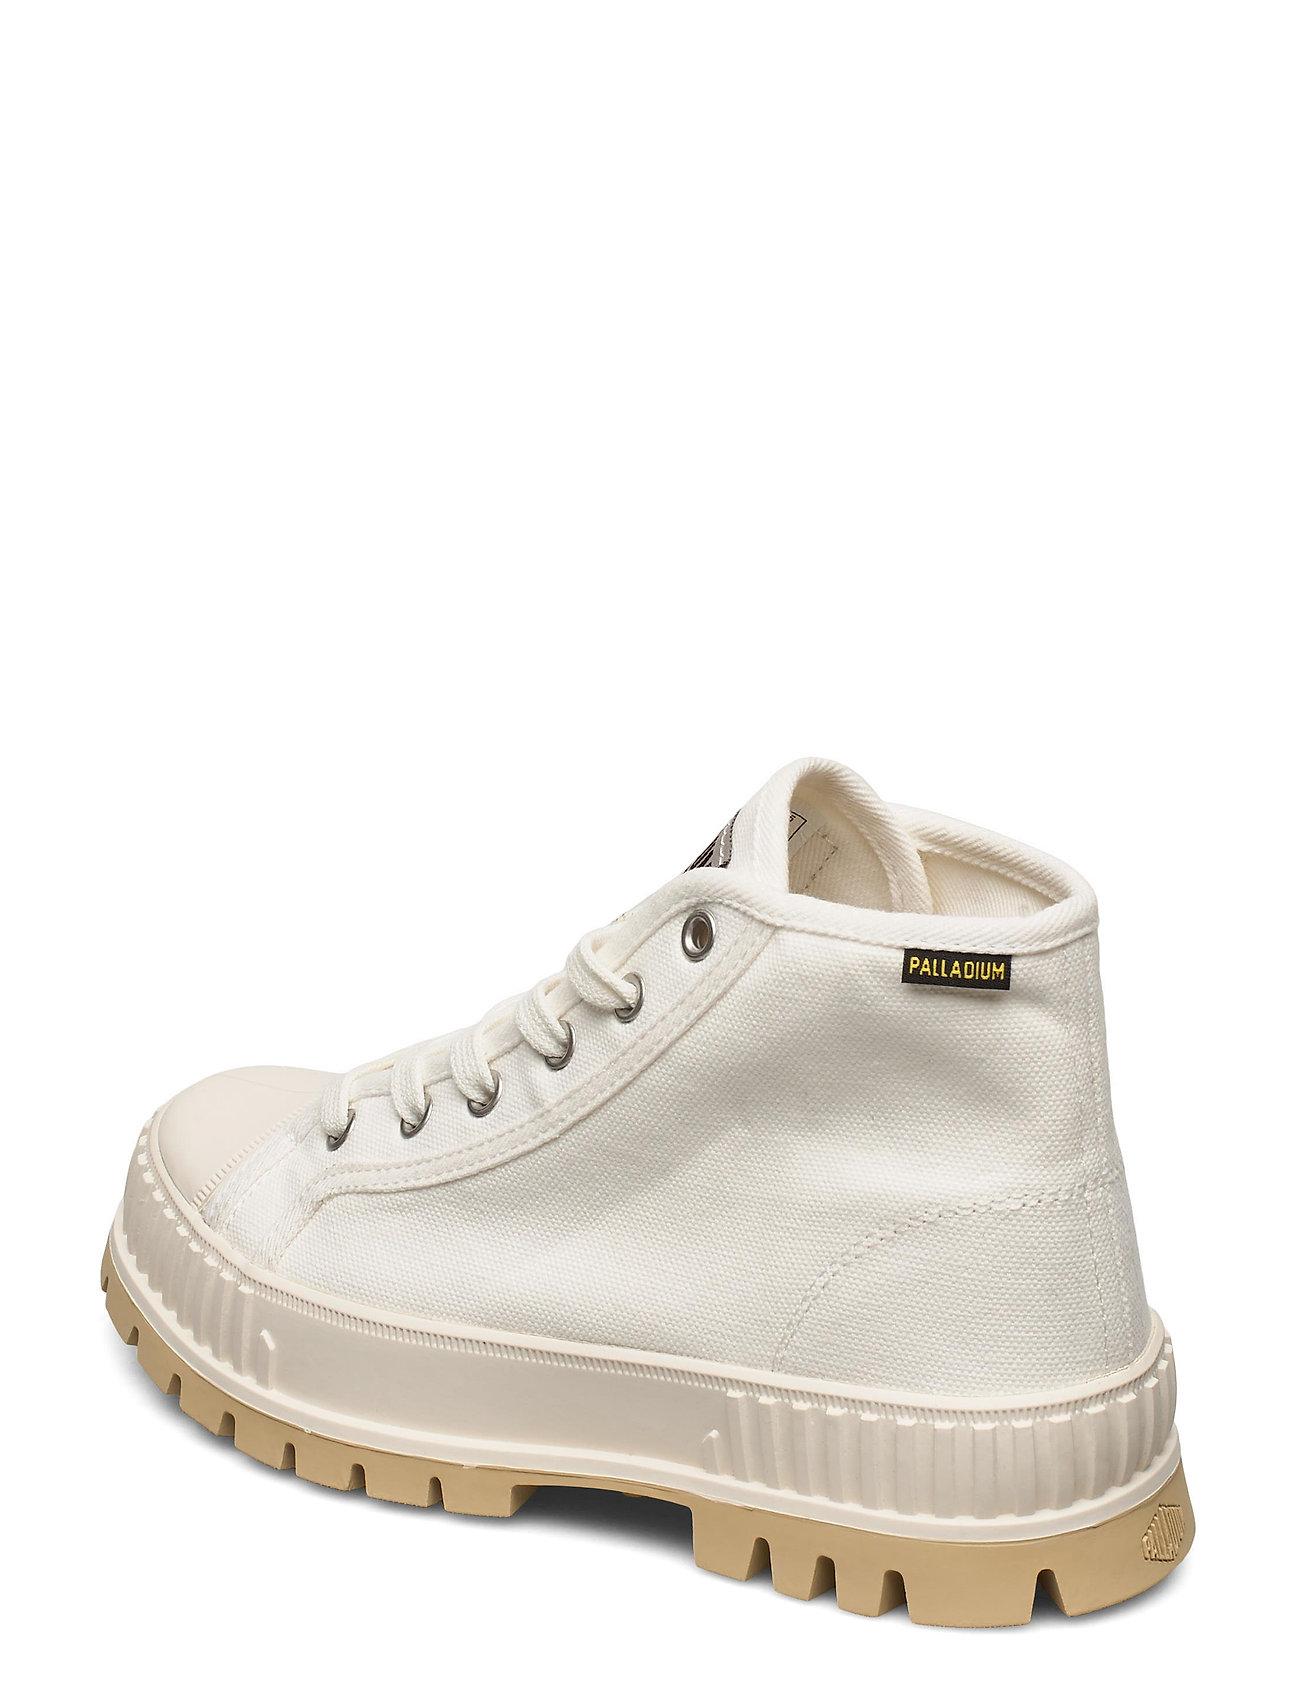 Pallashock Mid Og High-top Sneakers Creme Palladium